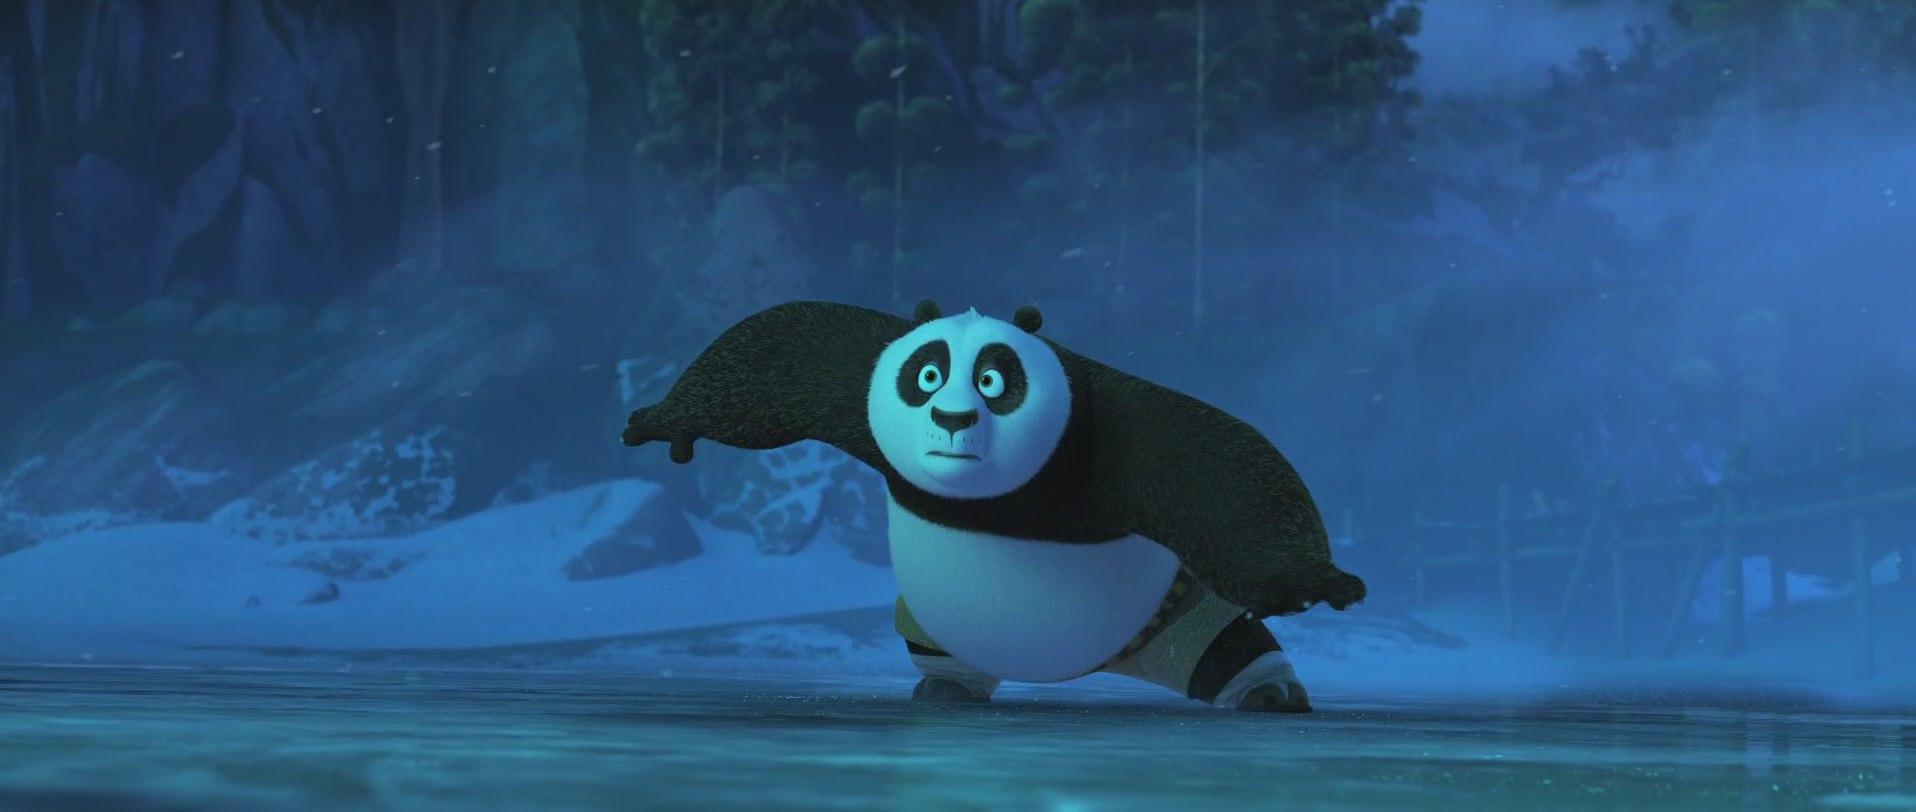 кунг-фу панда в шоке